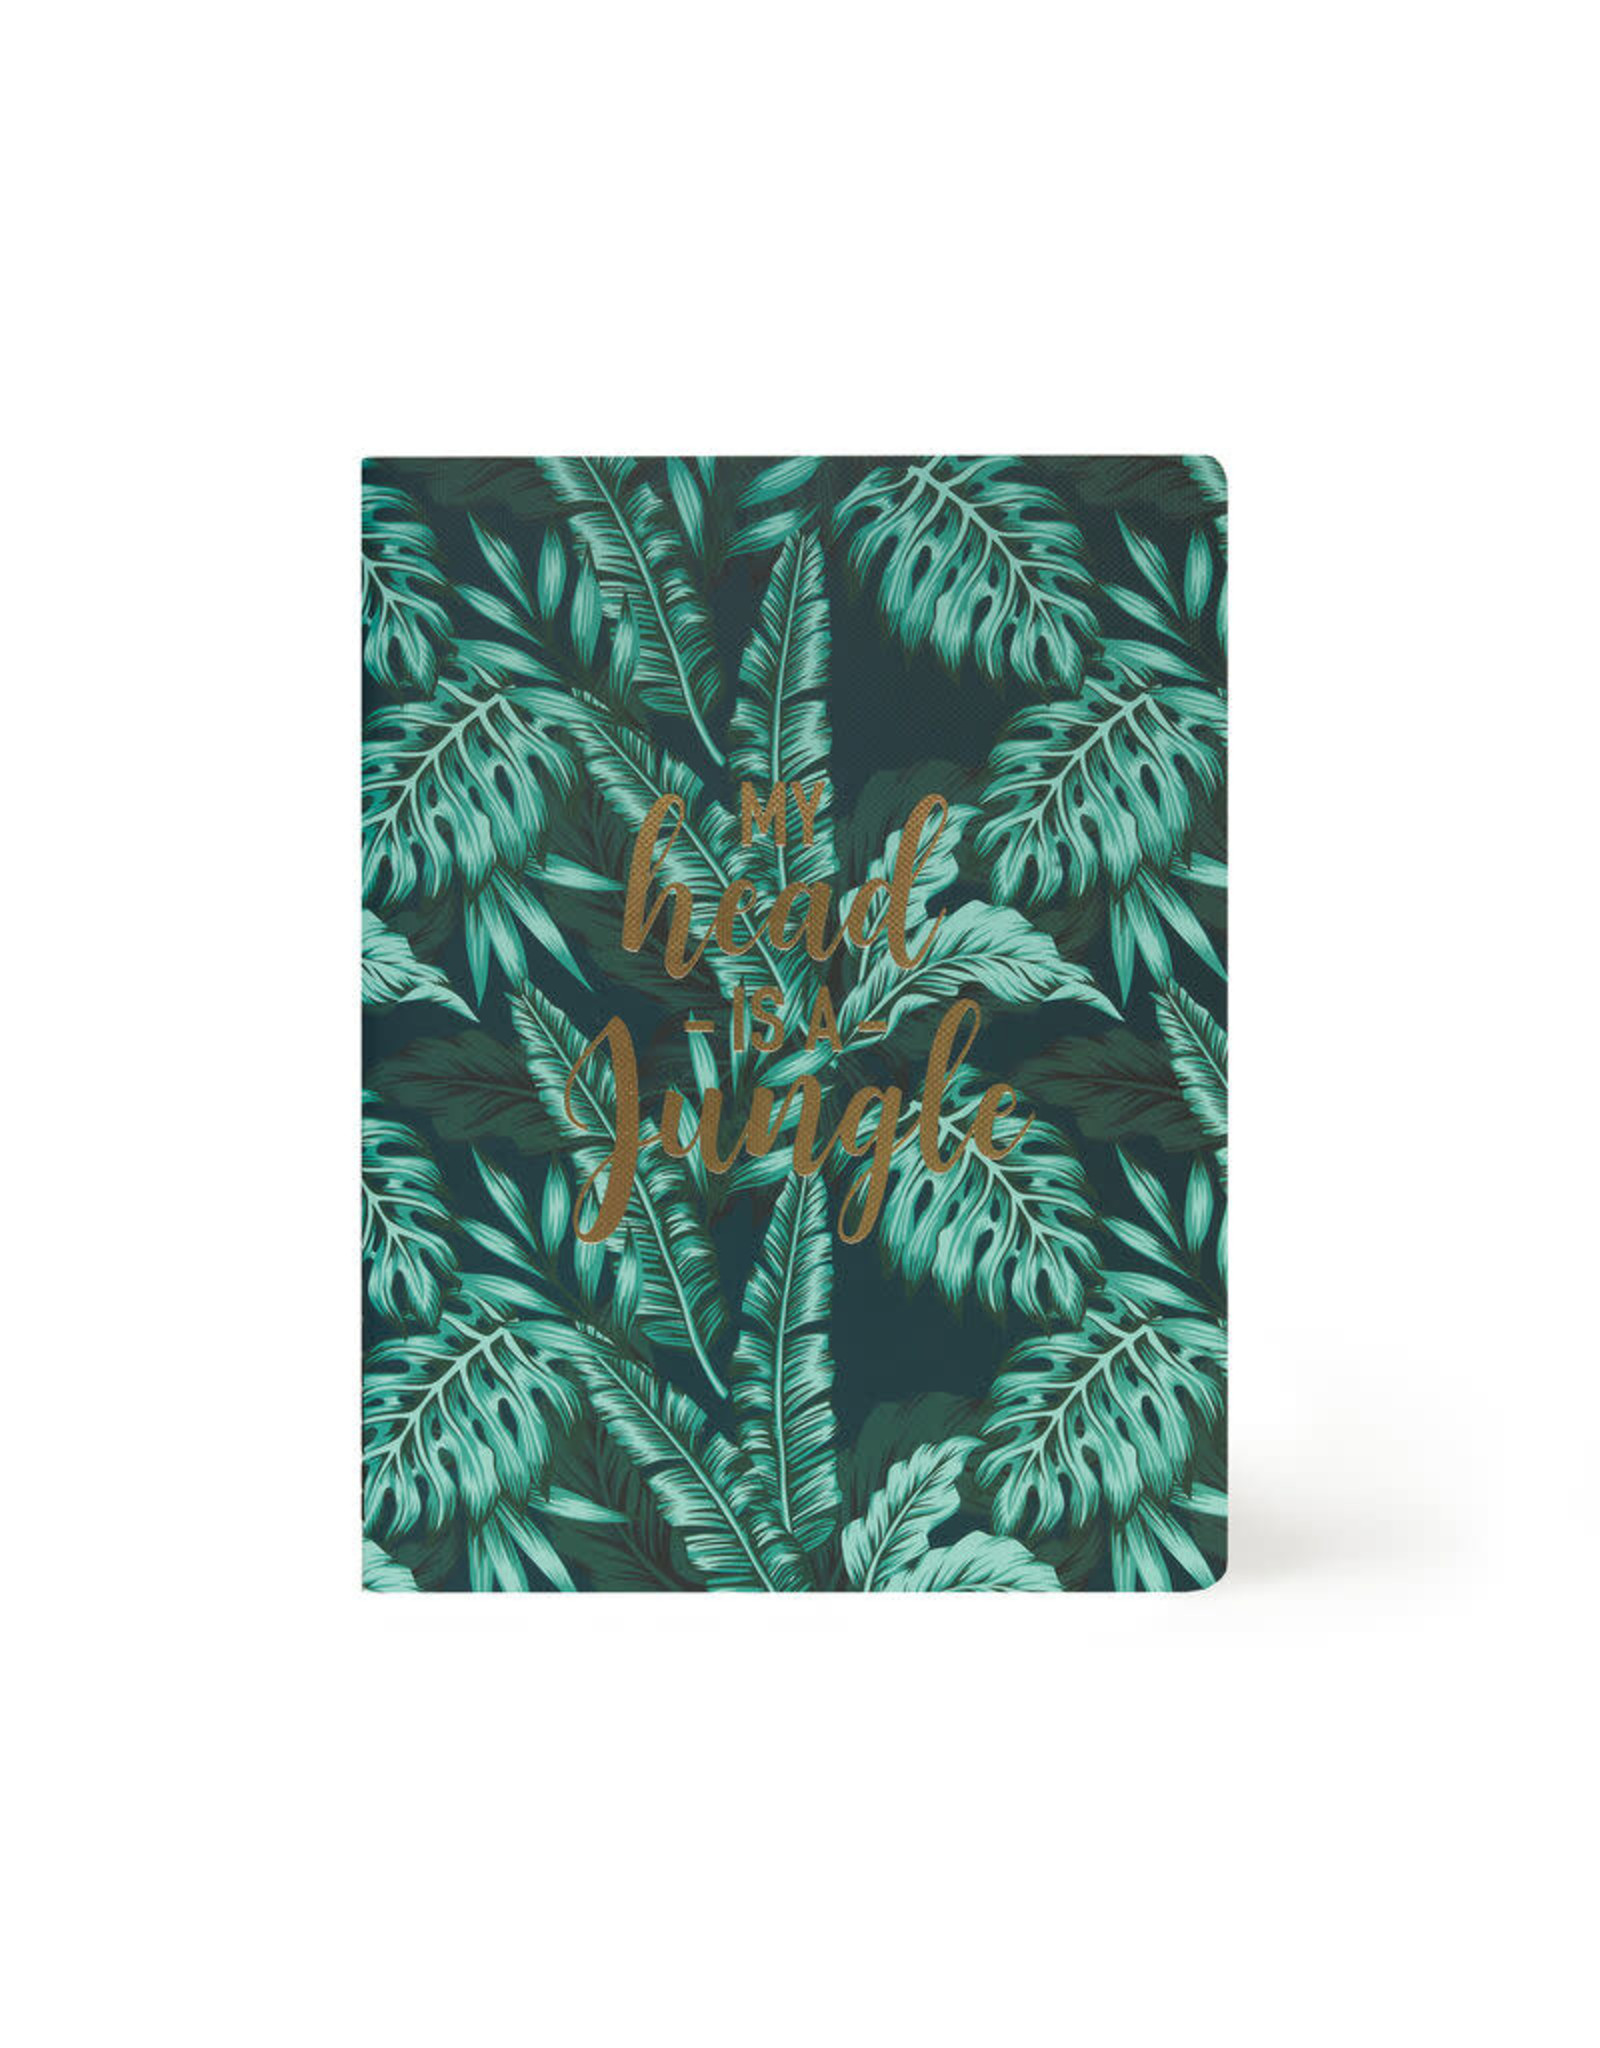 Notaboek gelijnd groot tropical leafs